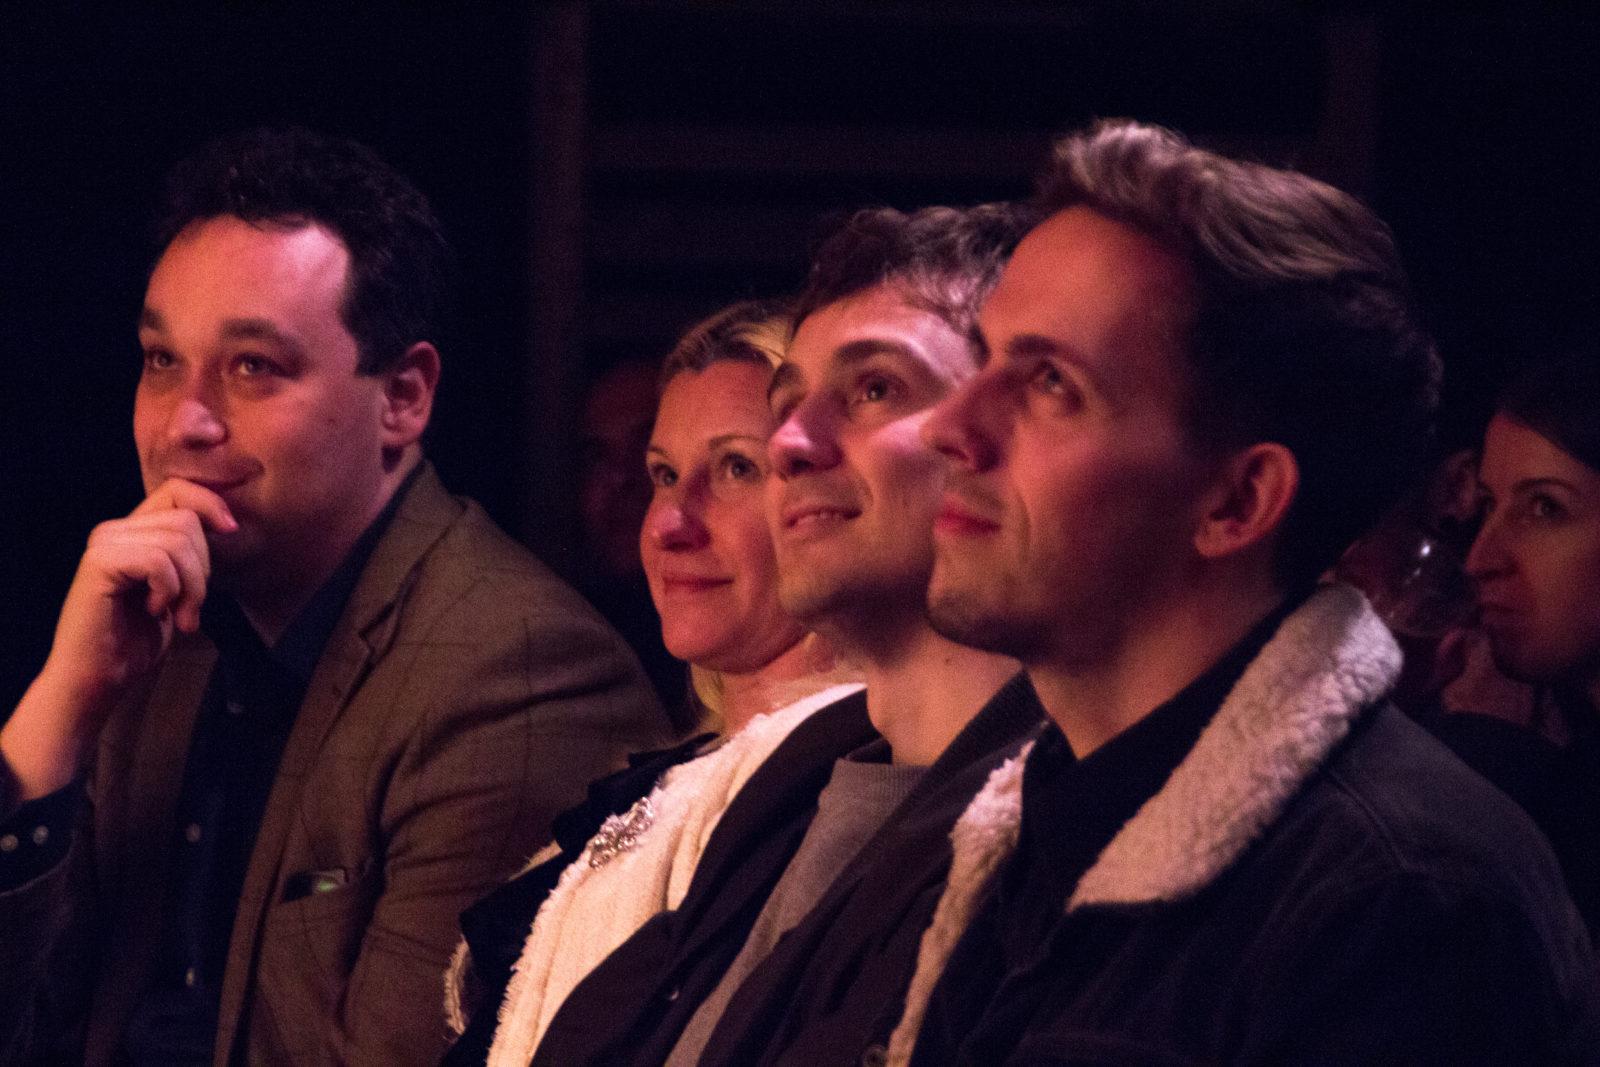 Feb 13th 2018 - Audience